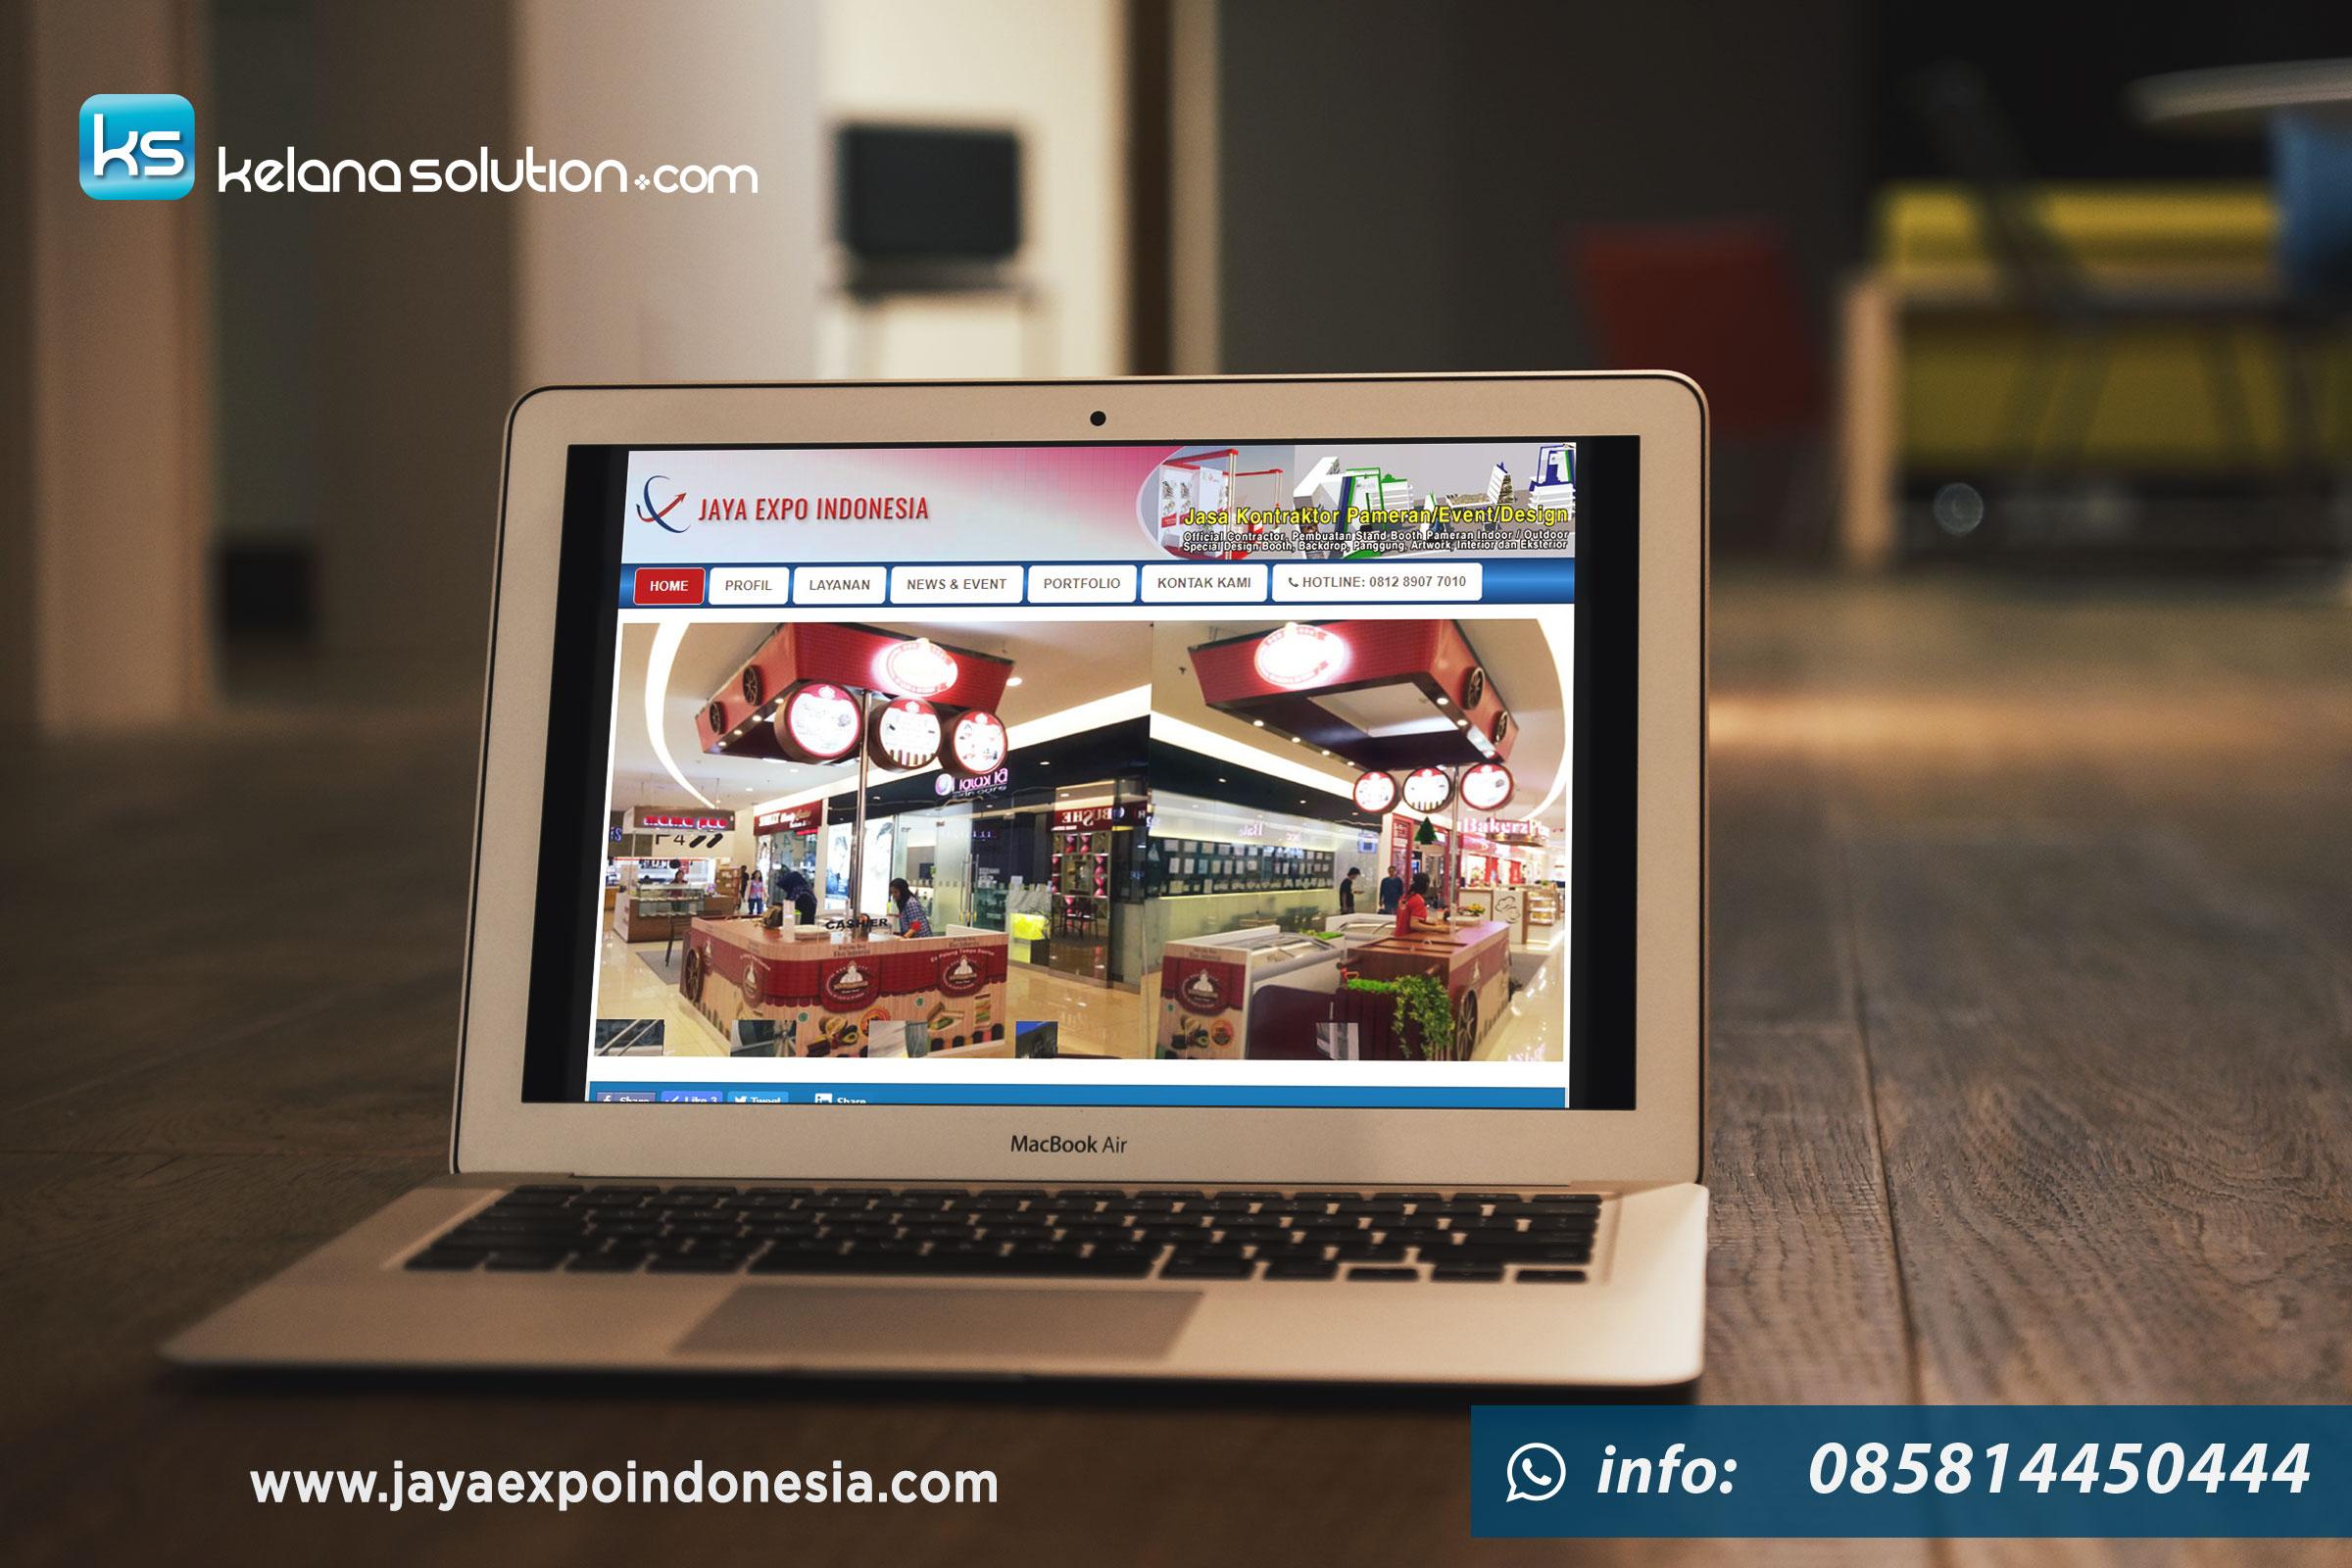 Kontraktor Kolam Renang Jaya Expo Indonesia